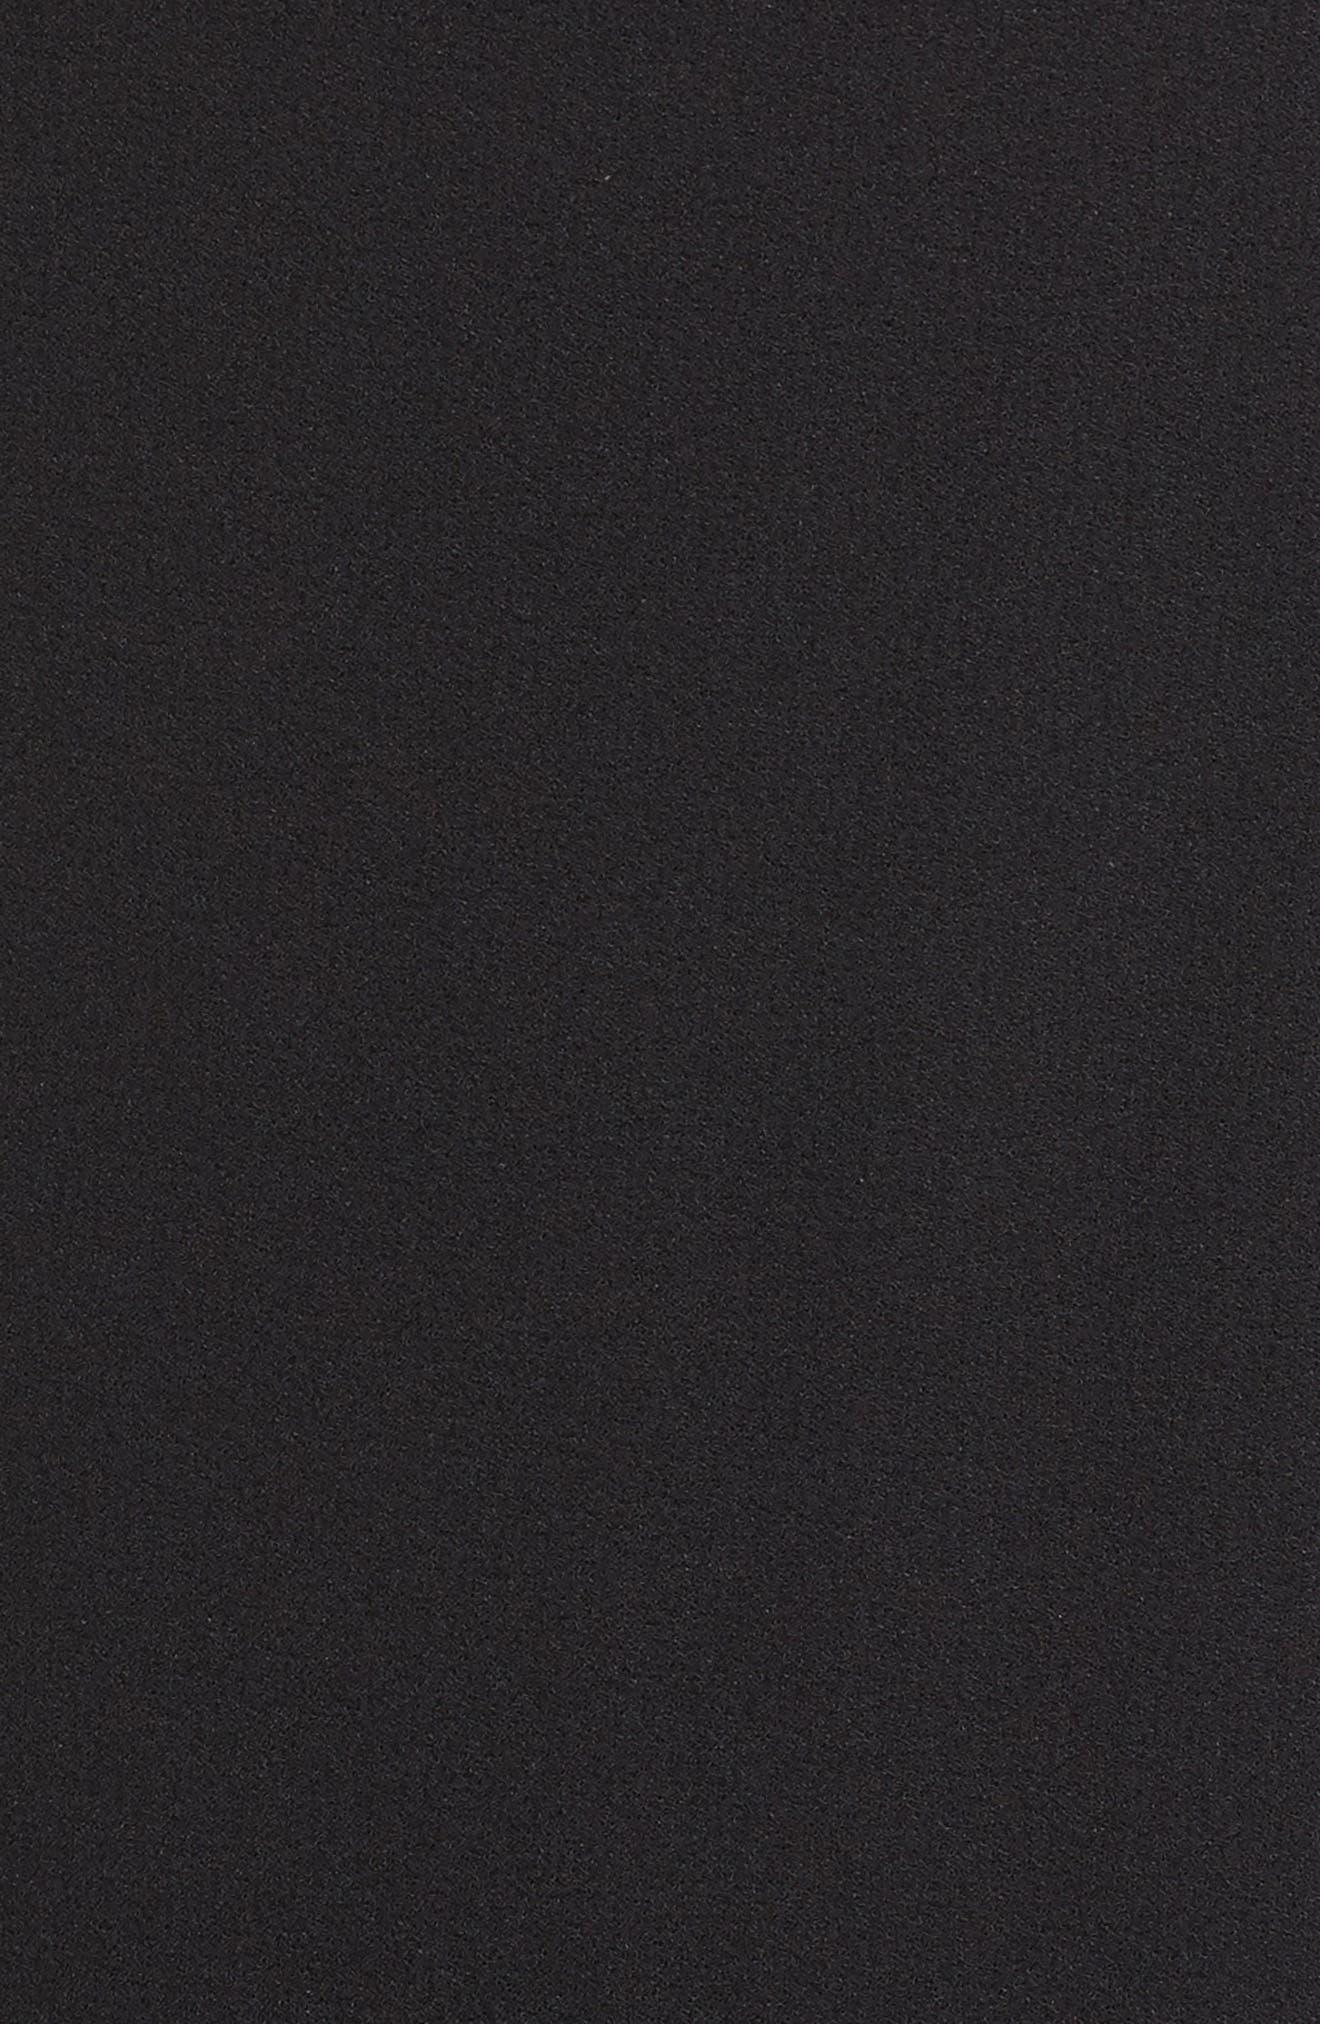 Ruffle Back Crepe Sheath Dress,                             Alternate thumbnail 5, color,                             002